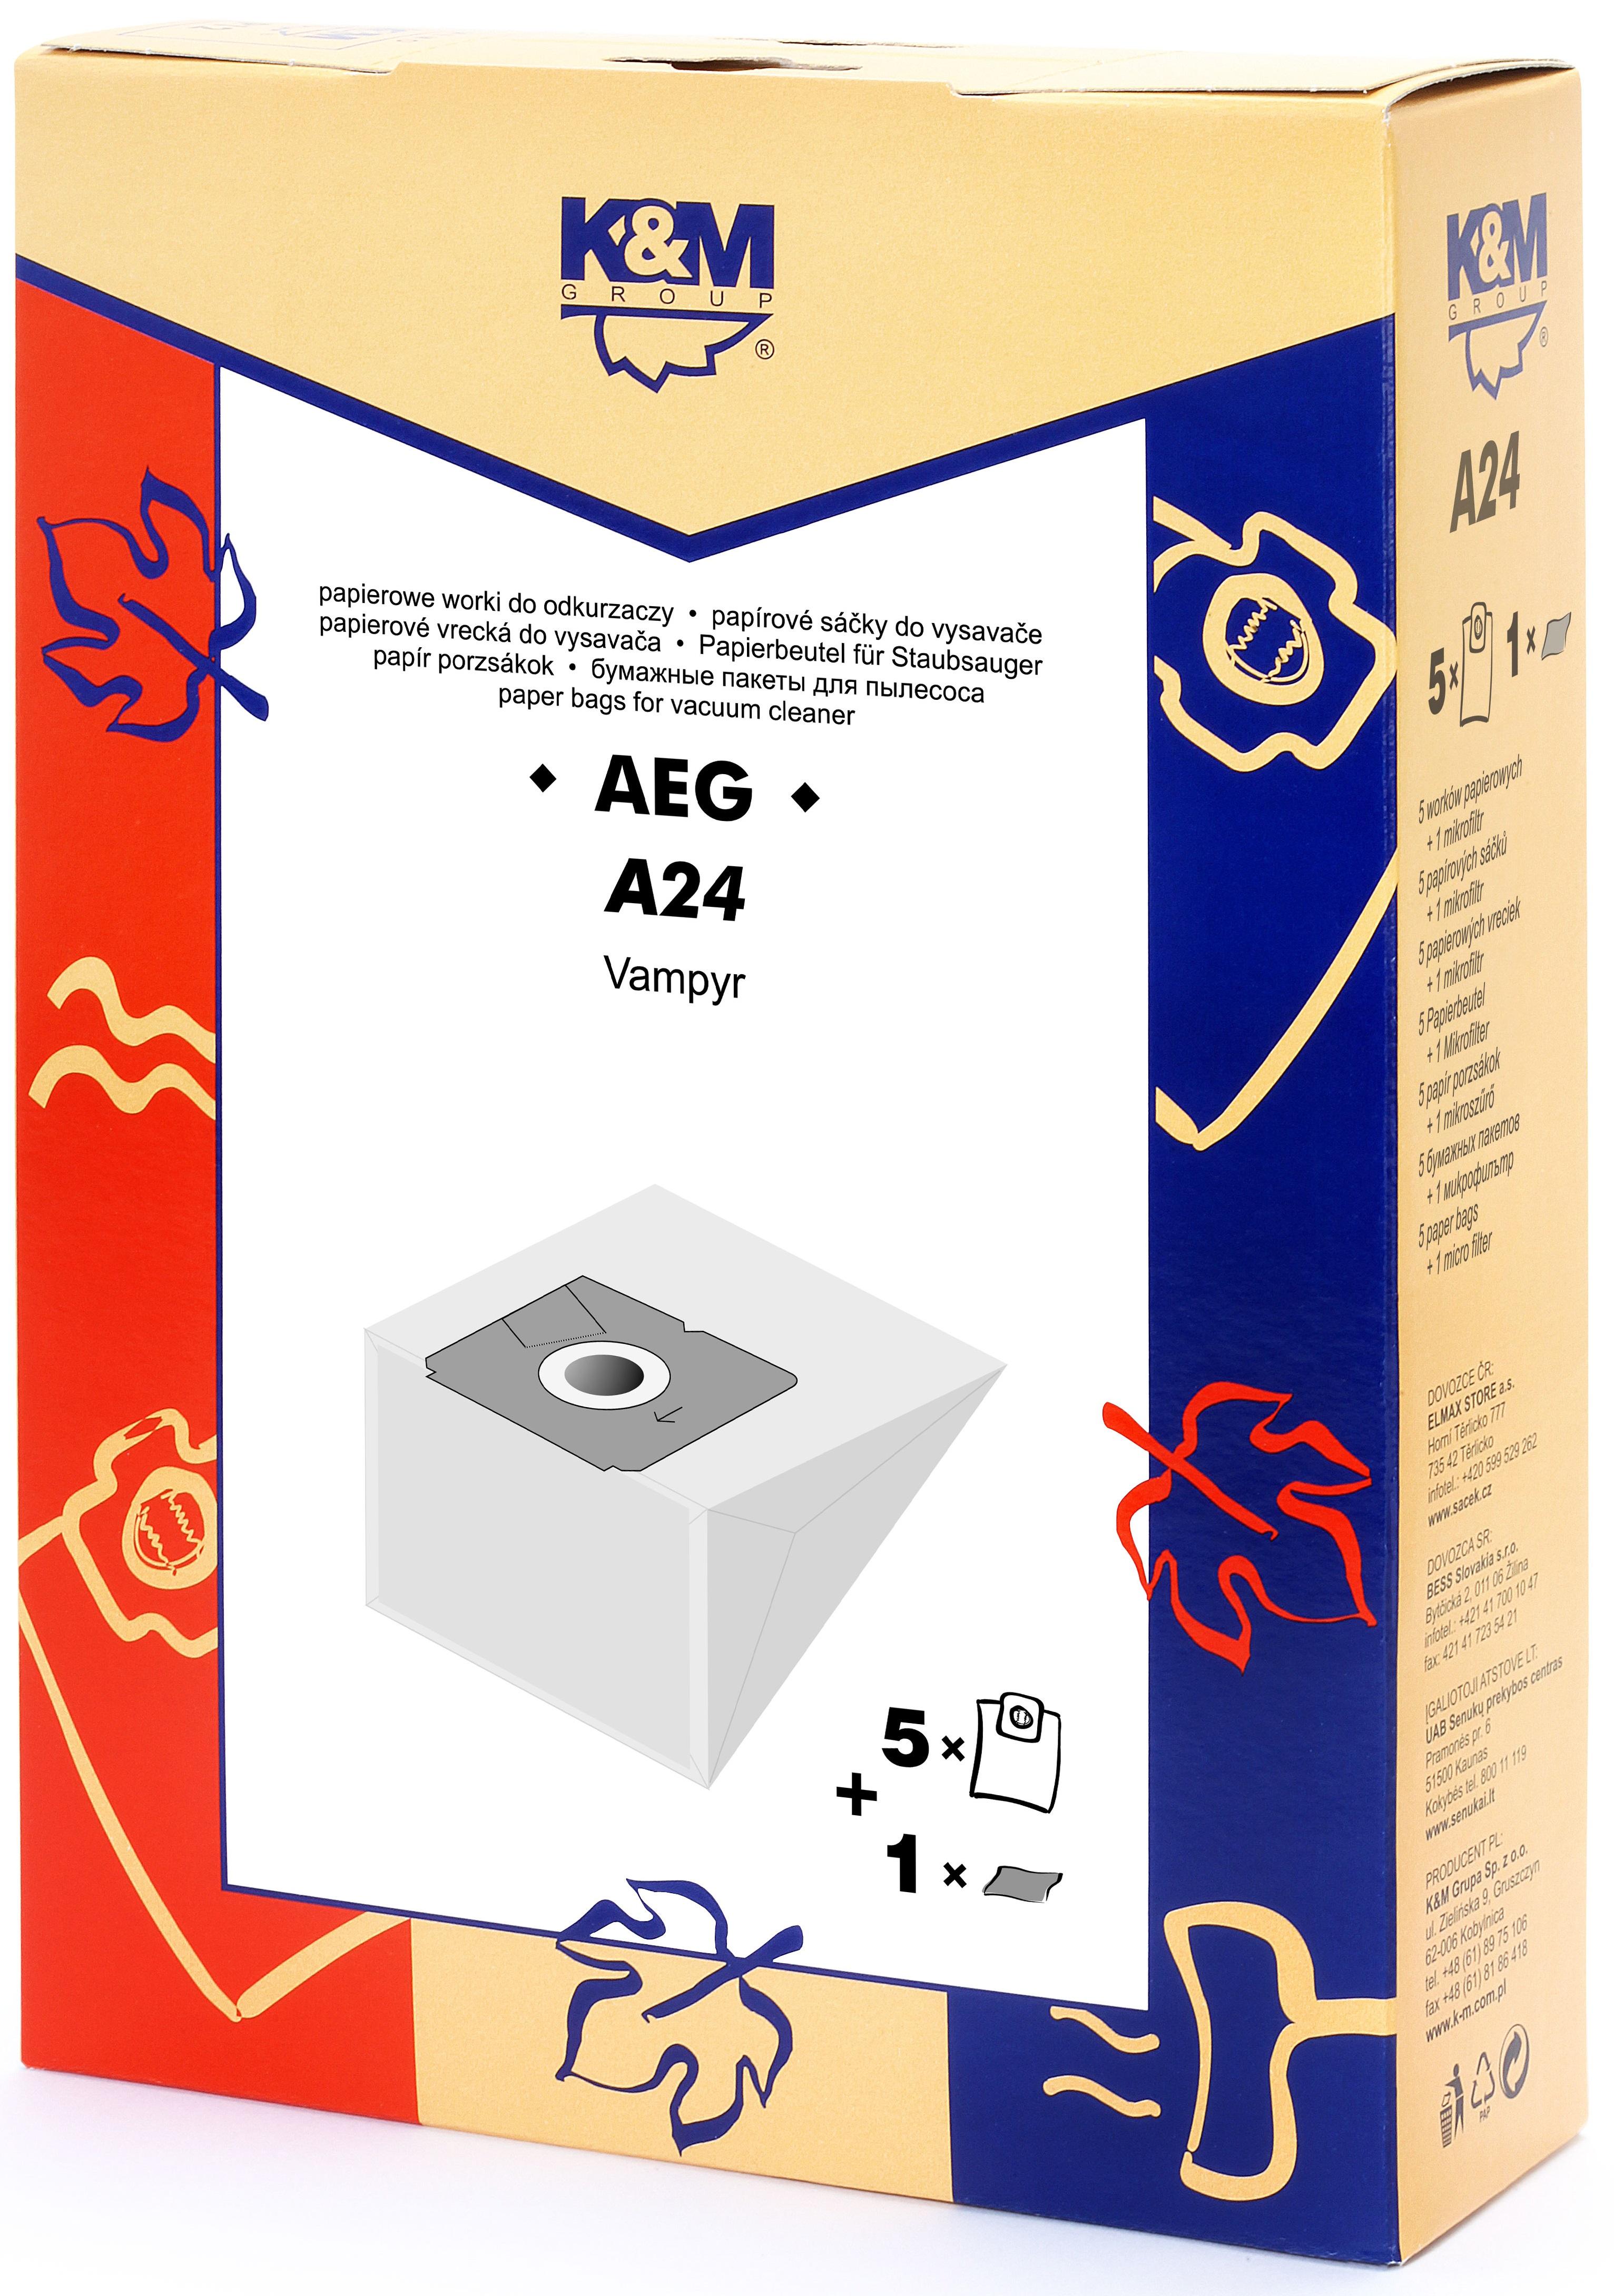 Sac aspirator AEG GR 28, hartie, 5 saci + 1 filtru, K&M [0]